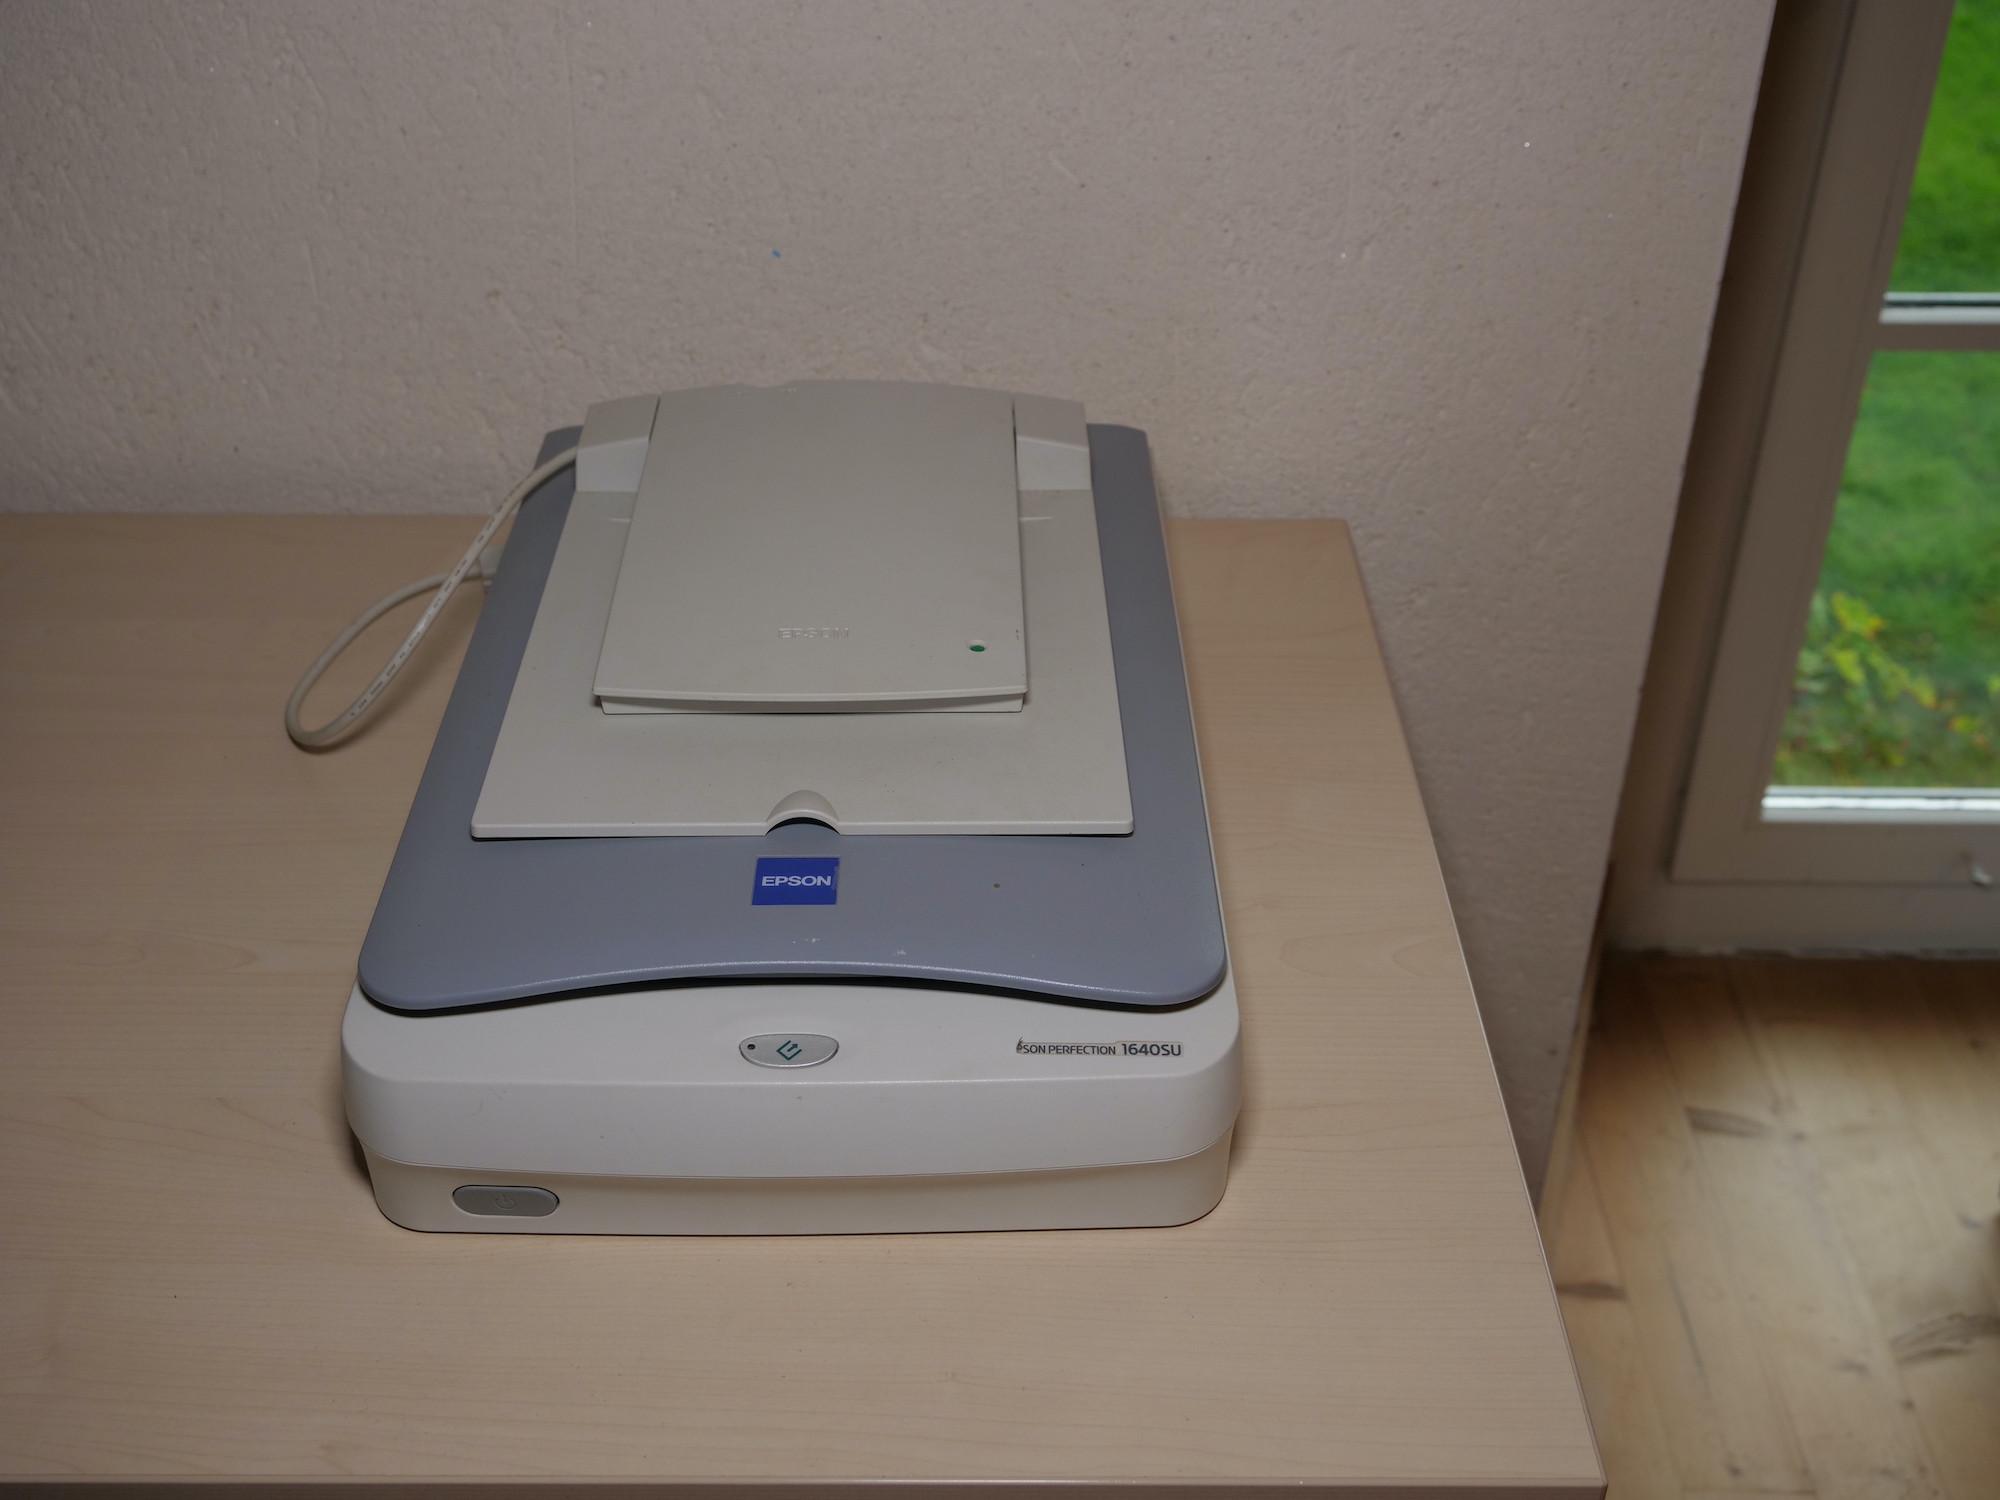 Epson R2880 / 1640SU Photo